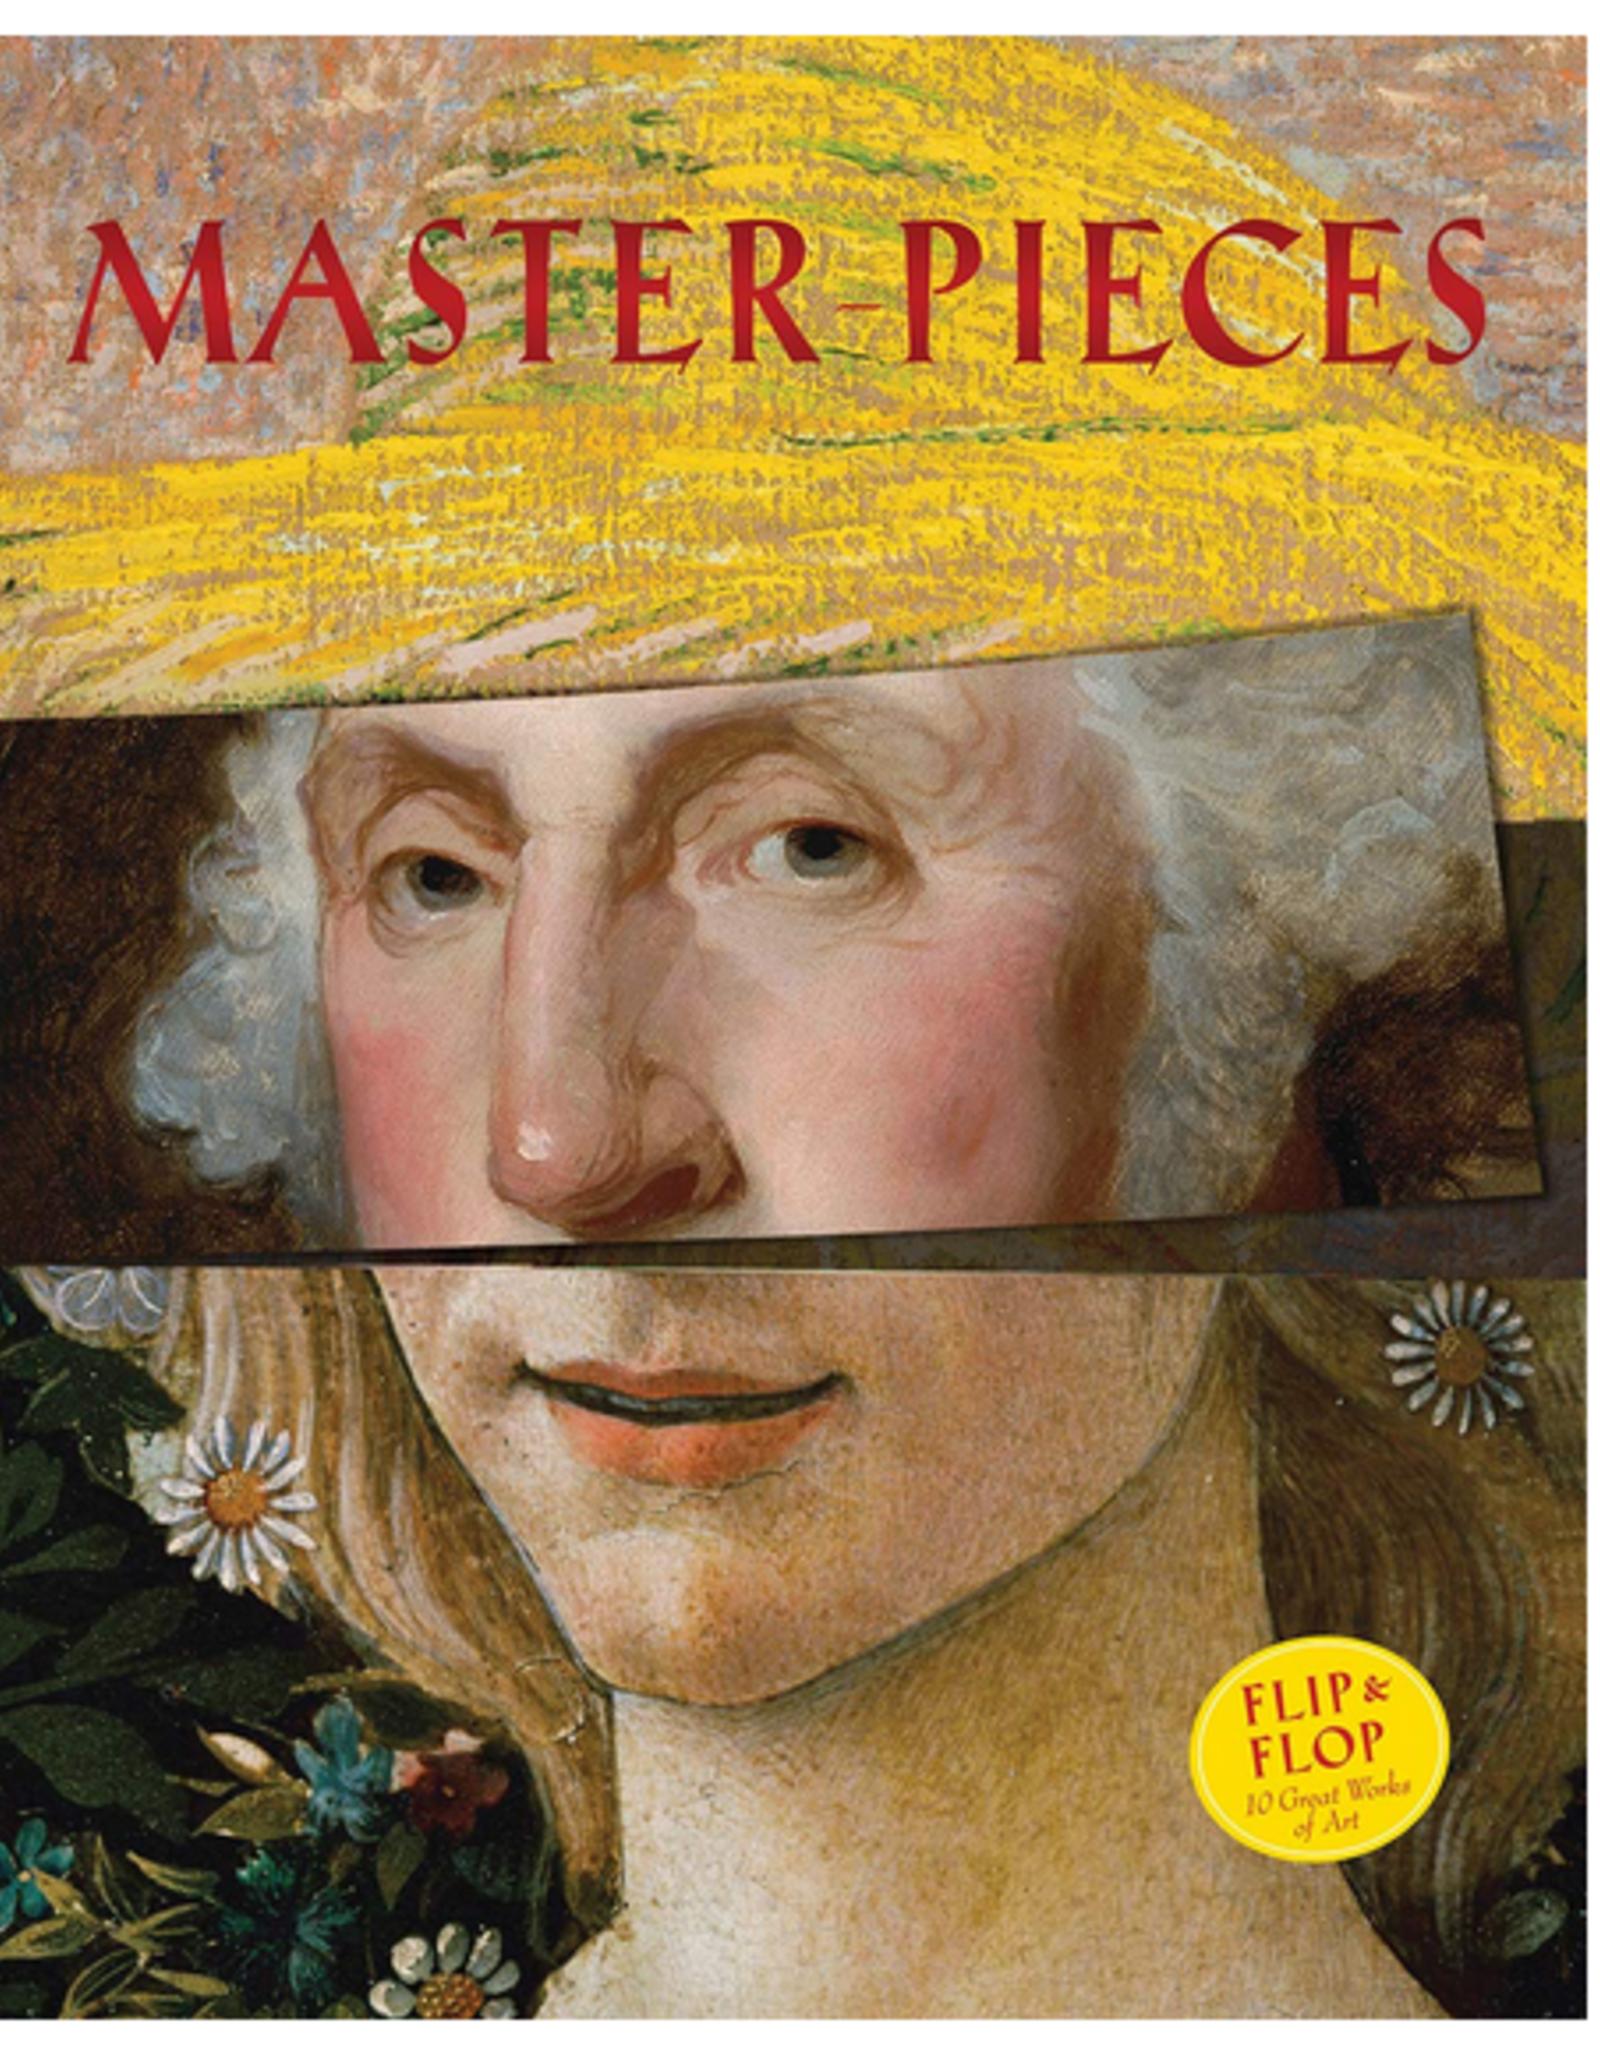 Master Pieces Flip & Flop